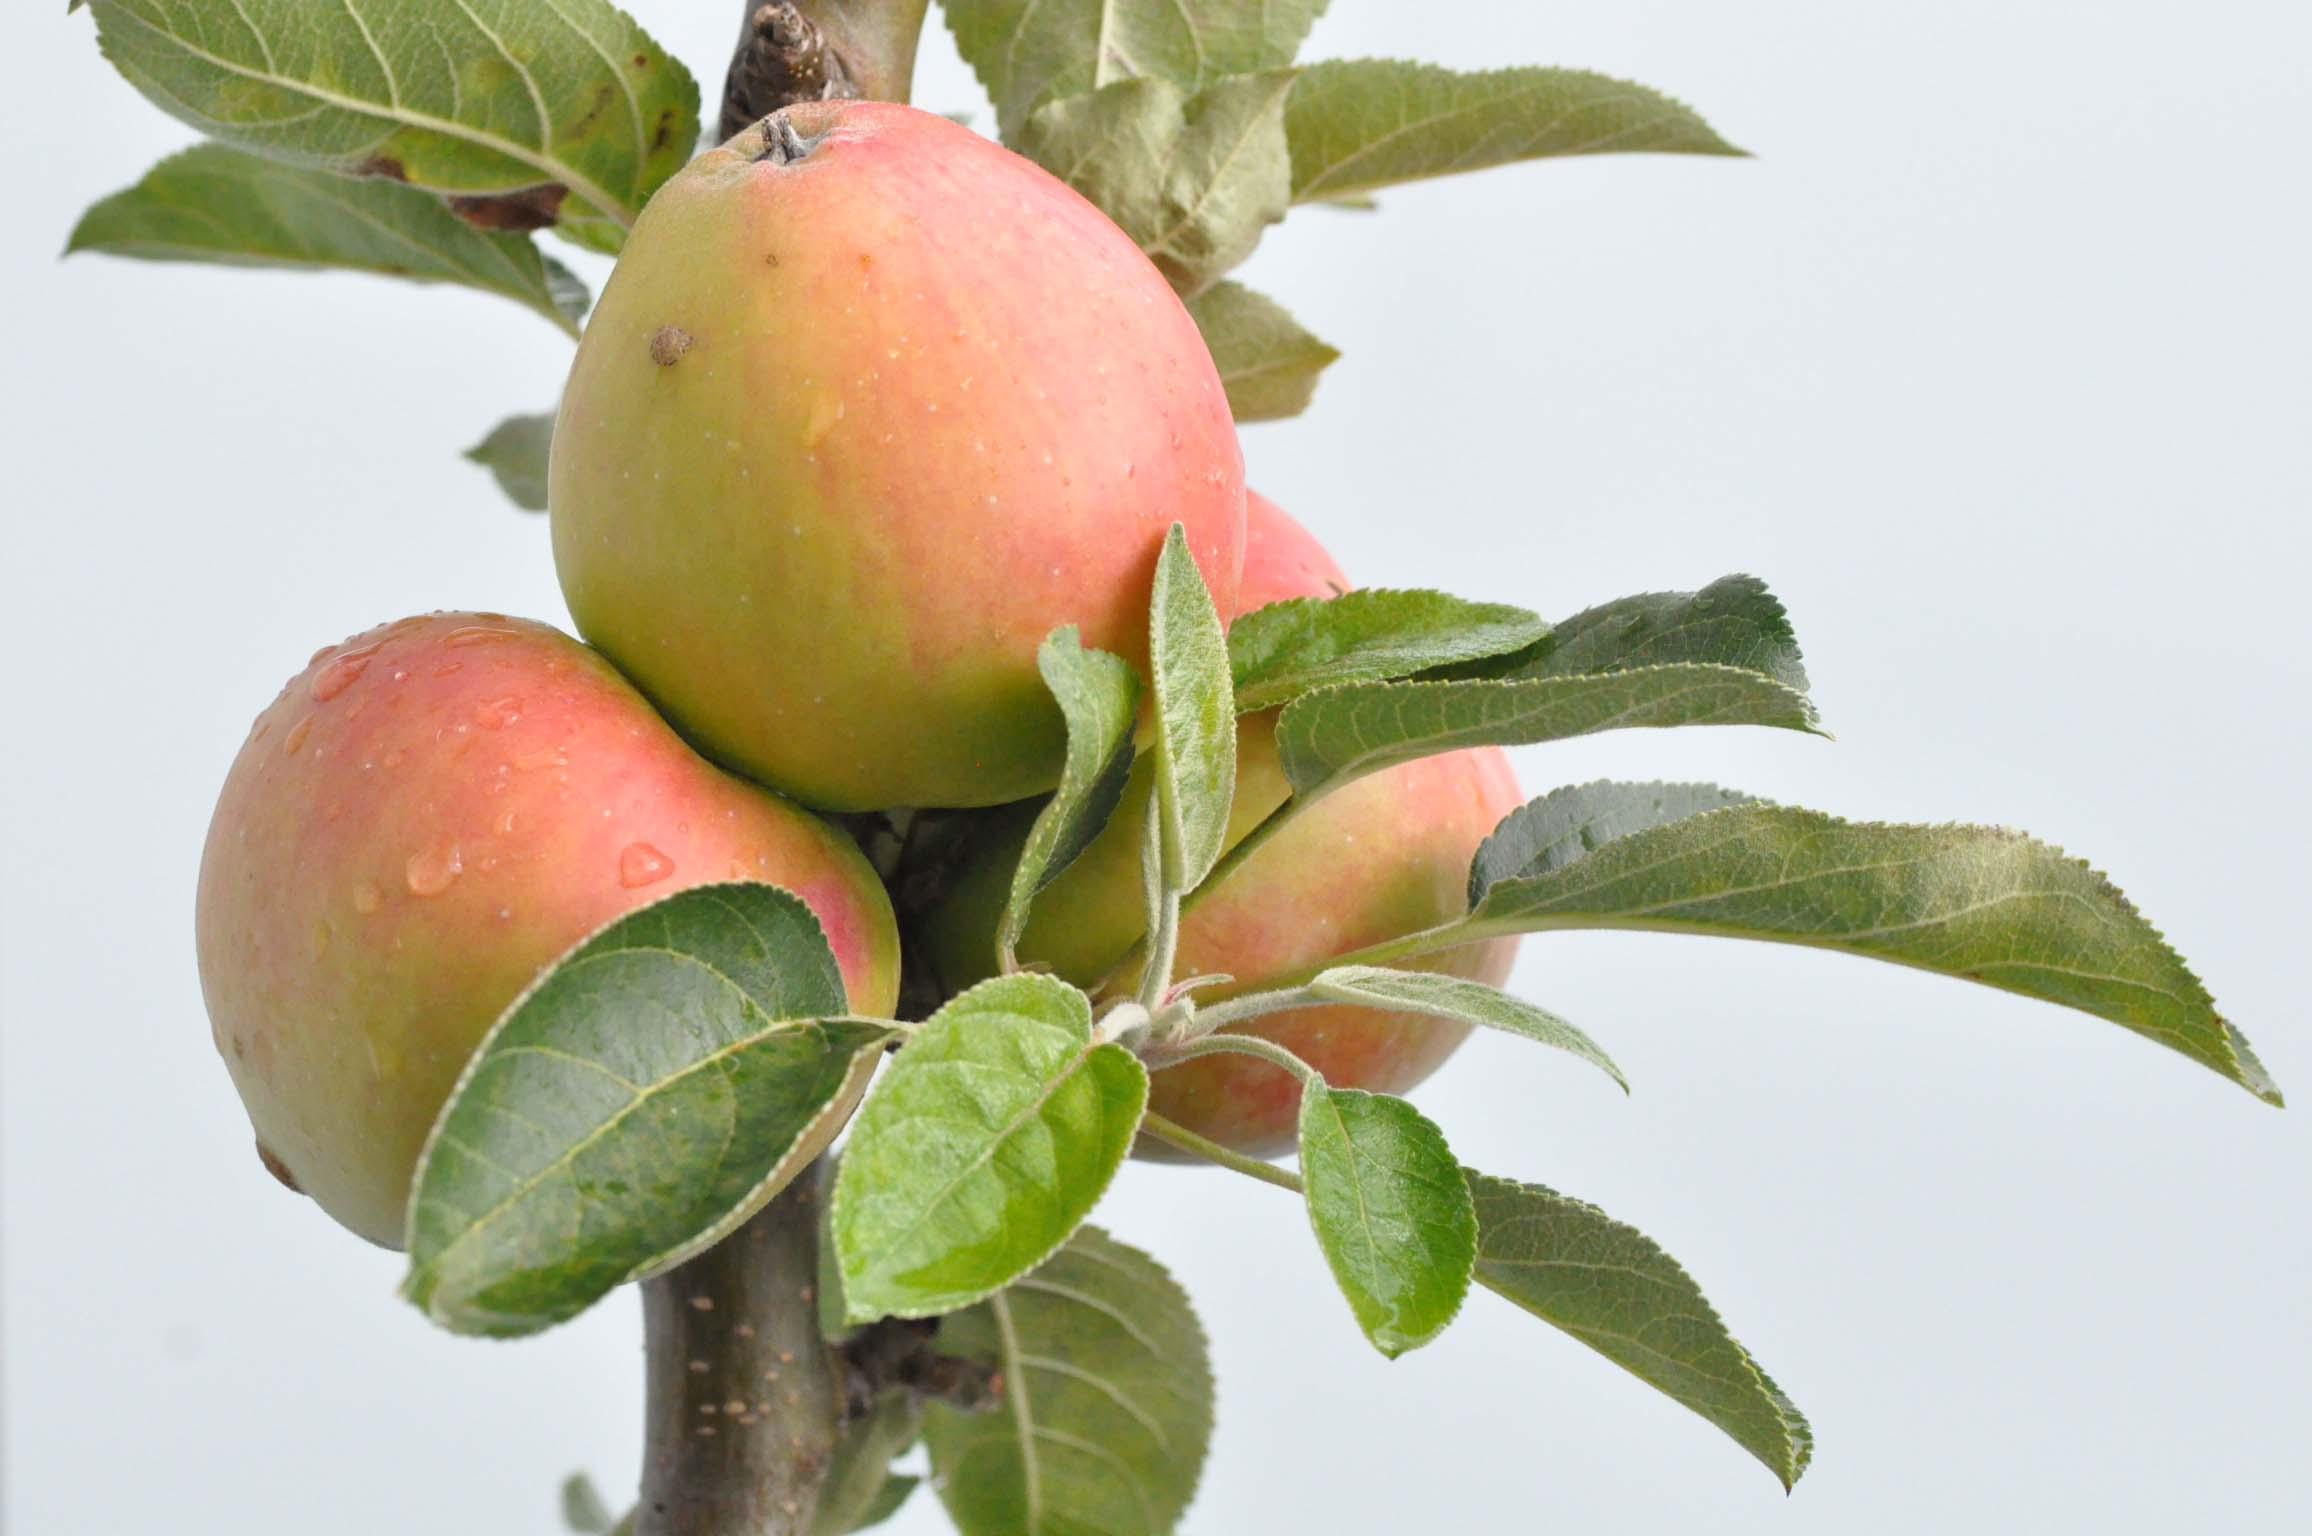 apples_terrace_bearbeitet-1